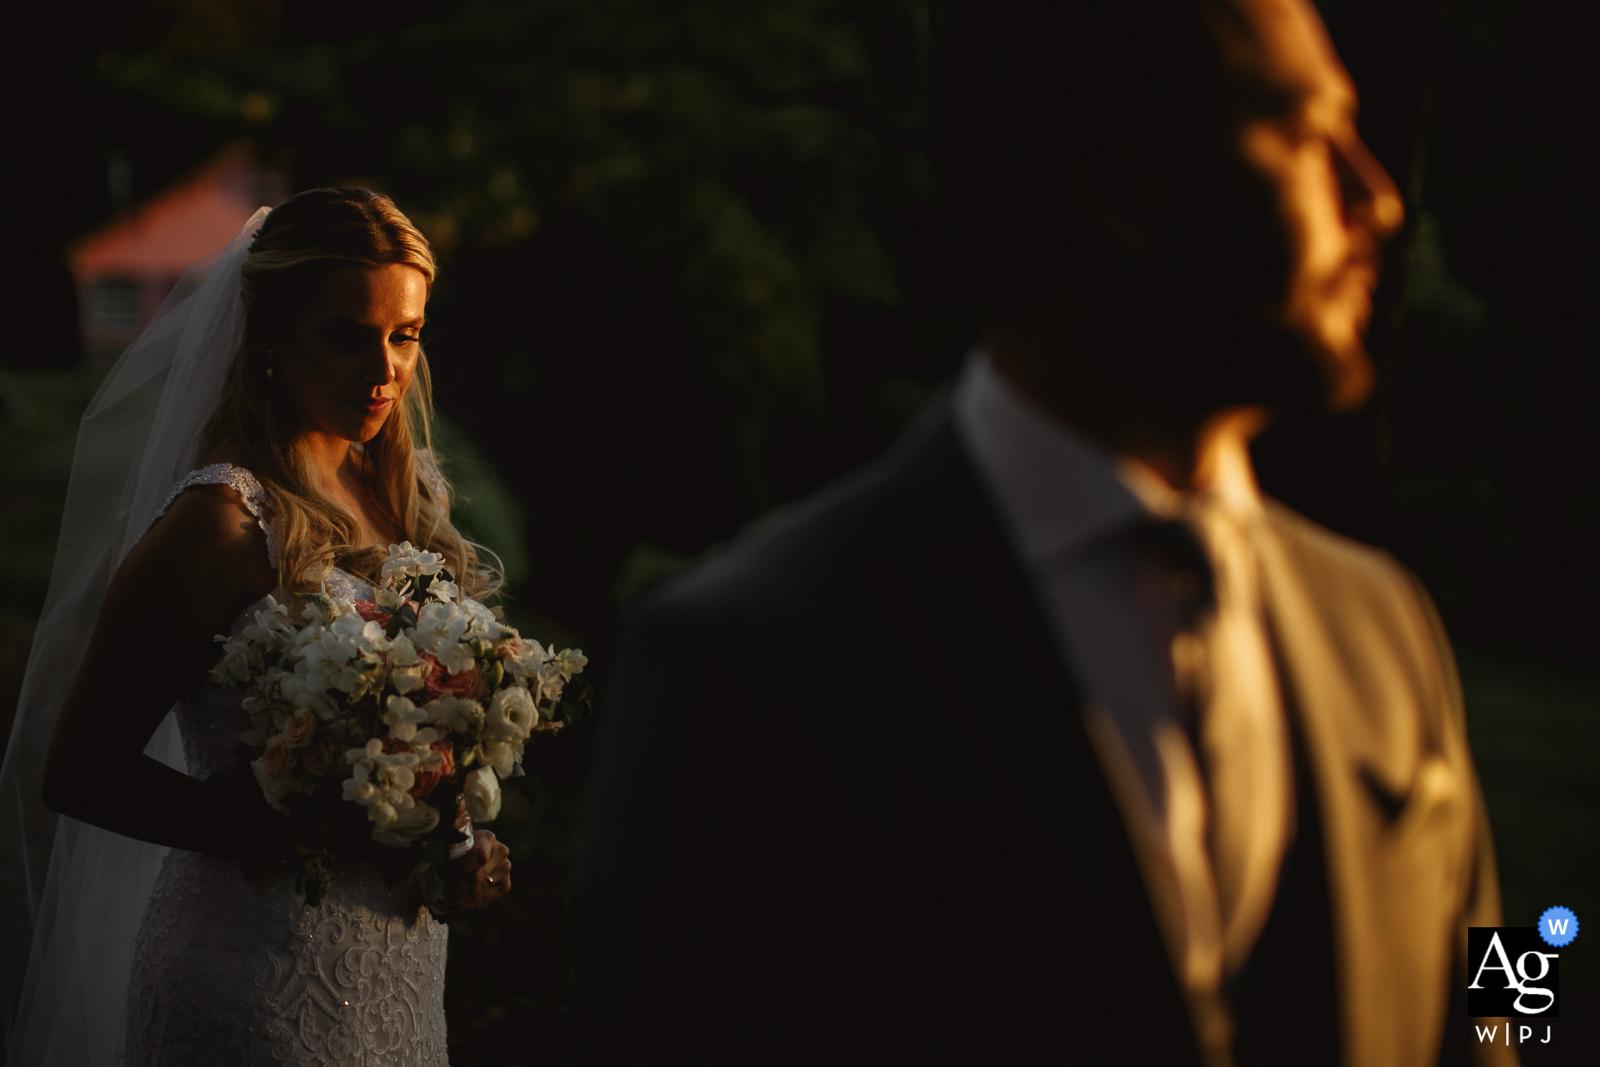 Hosteria Vall De Buia - Santa Maria - Brasil Bride wedding portrait behind the groom with sun entrance